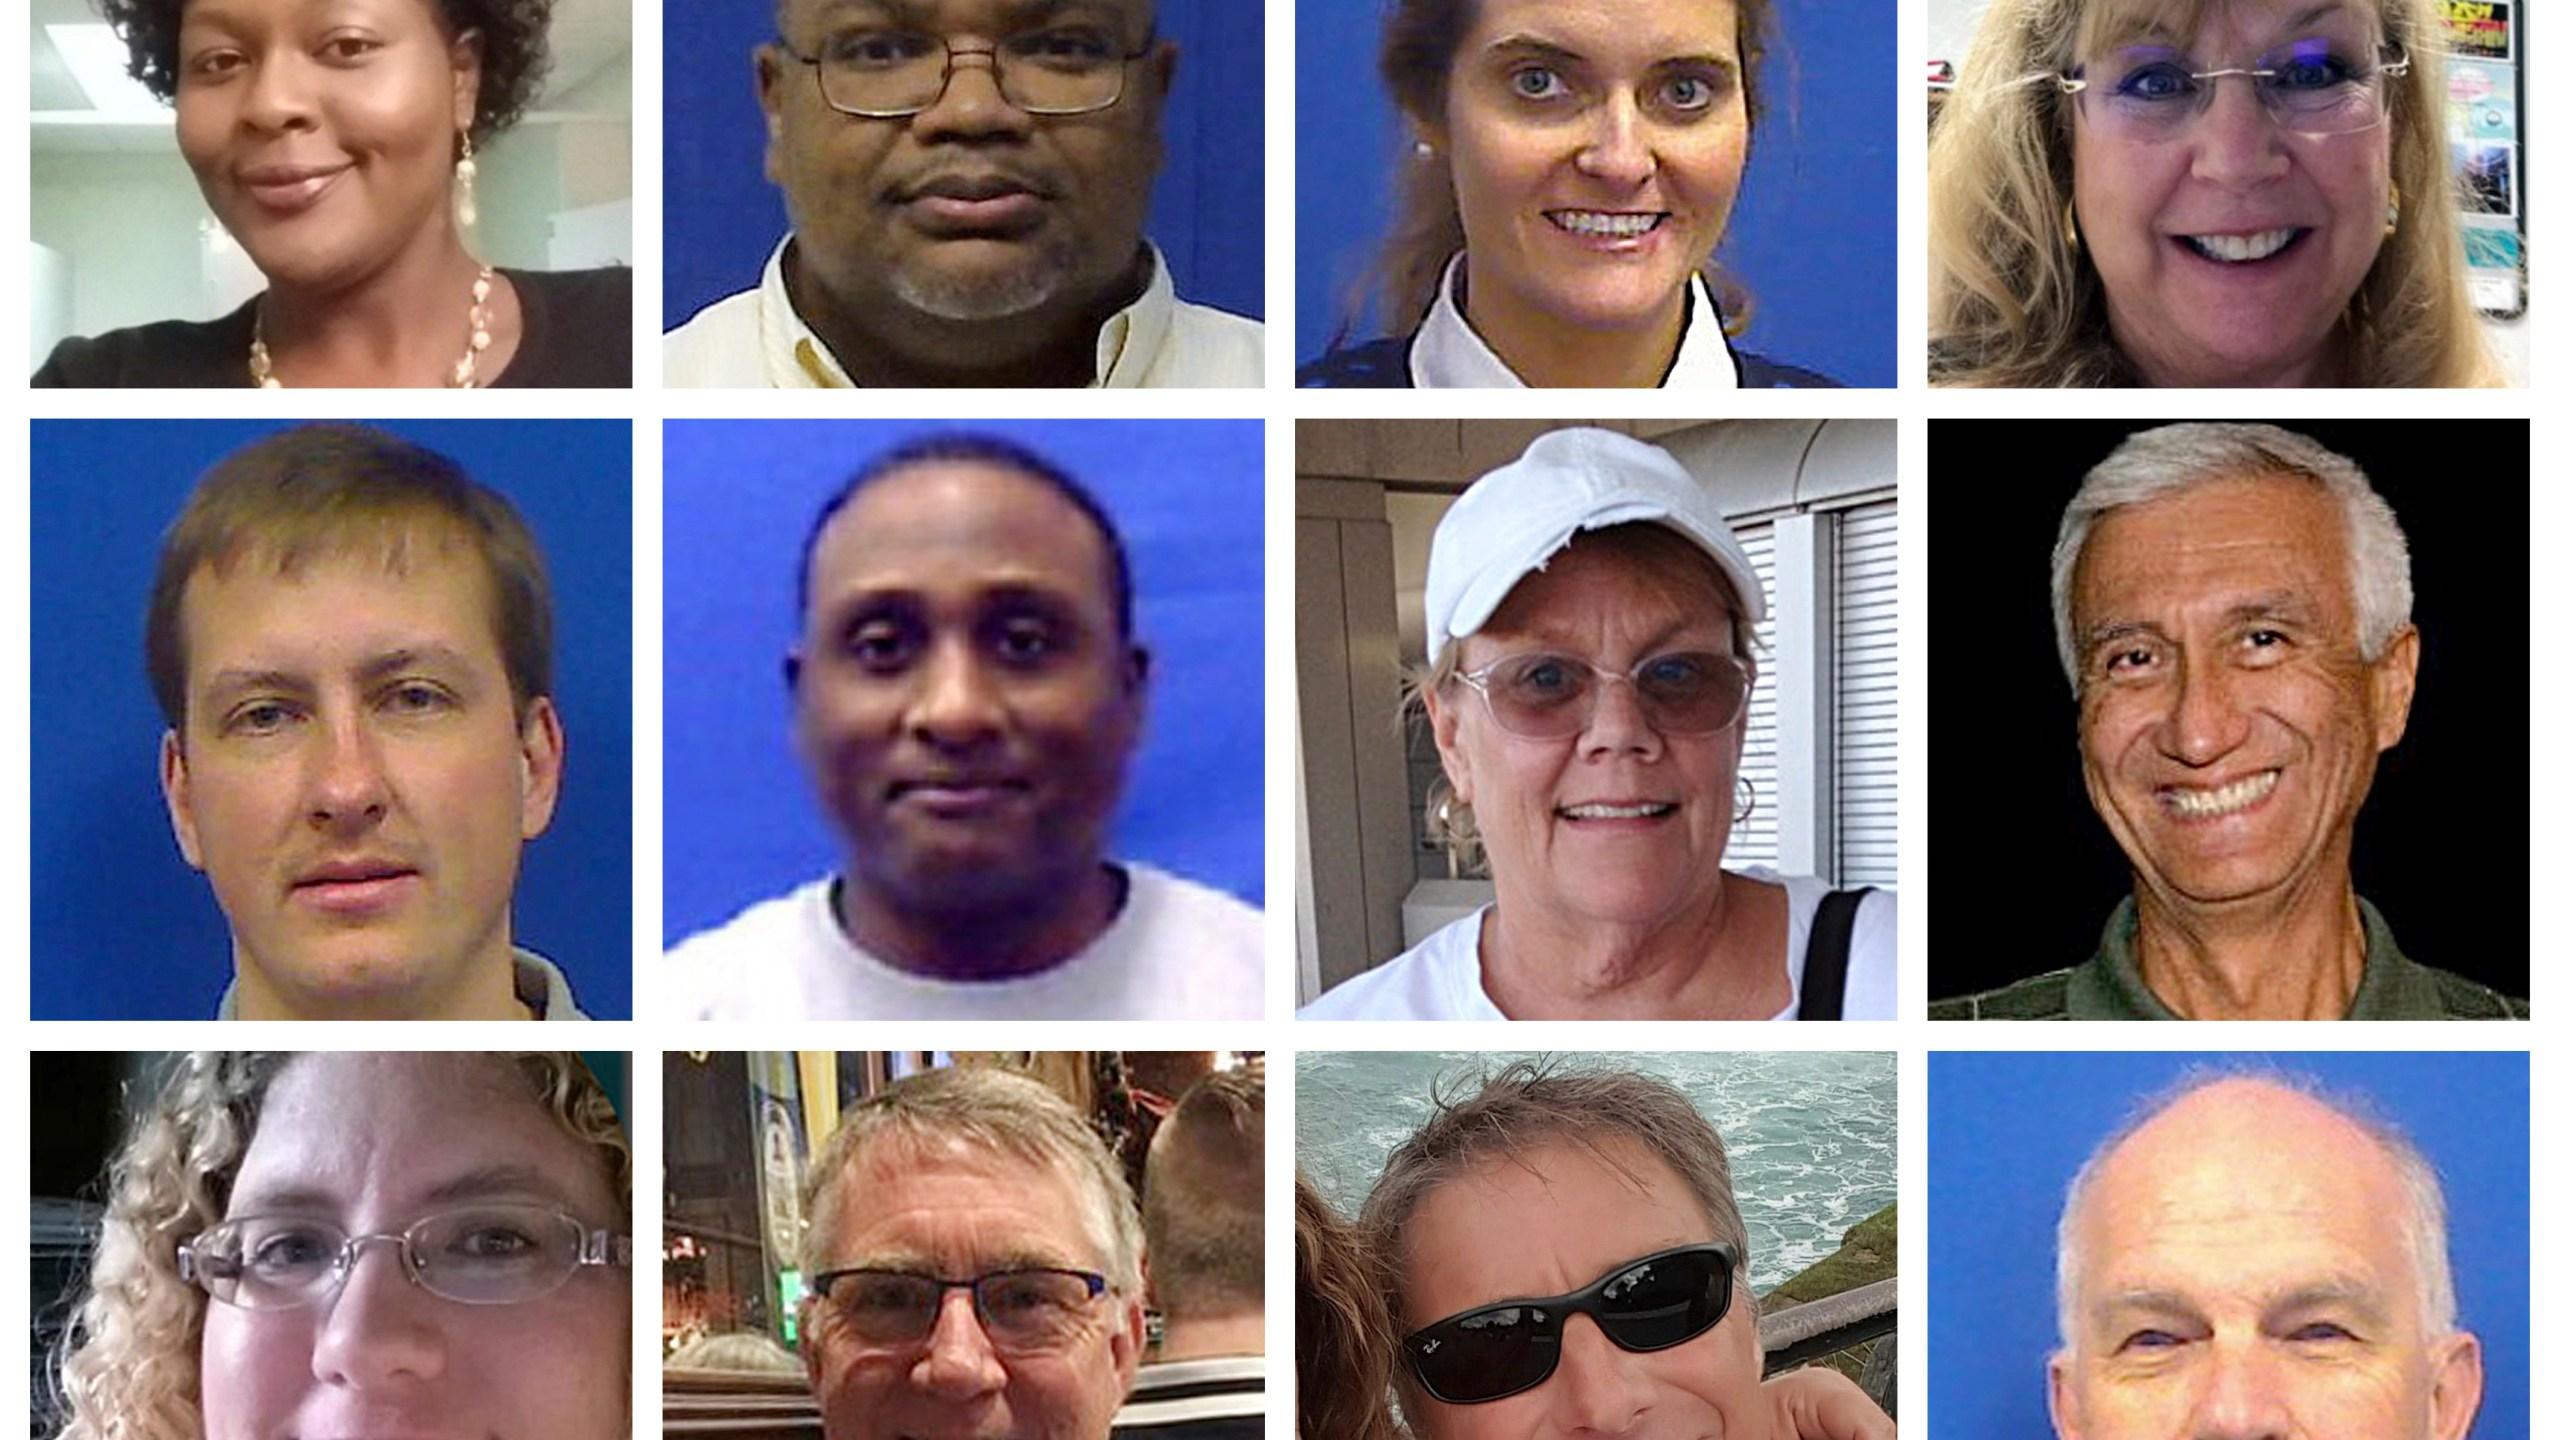 Virginia_Beach_Shooting_Victims_95912-159532.jpg50821587